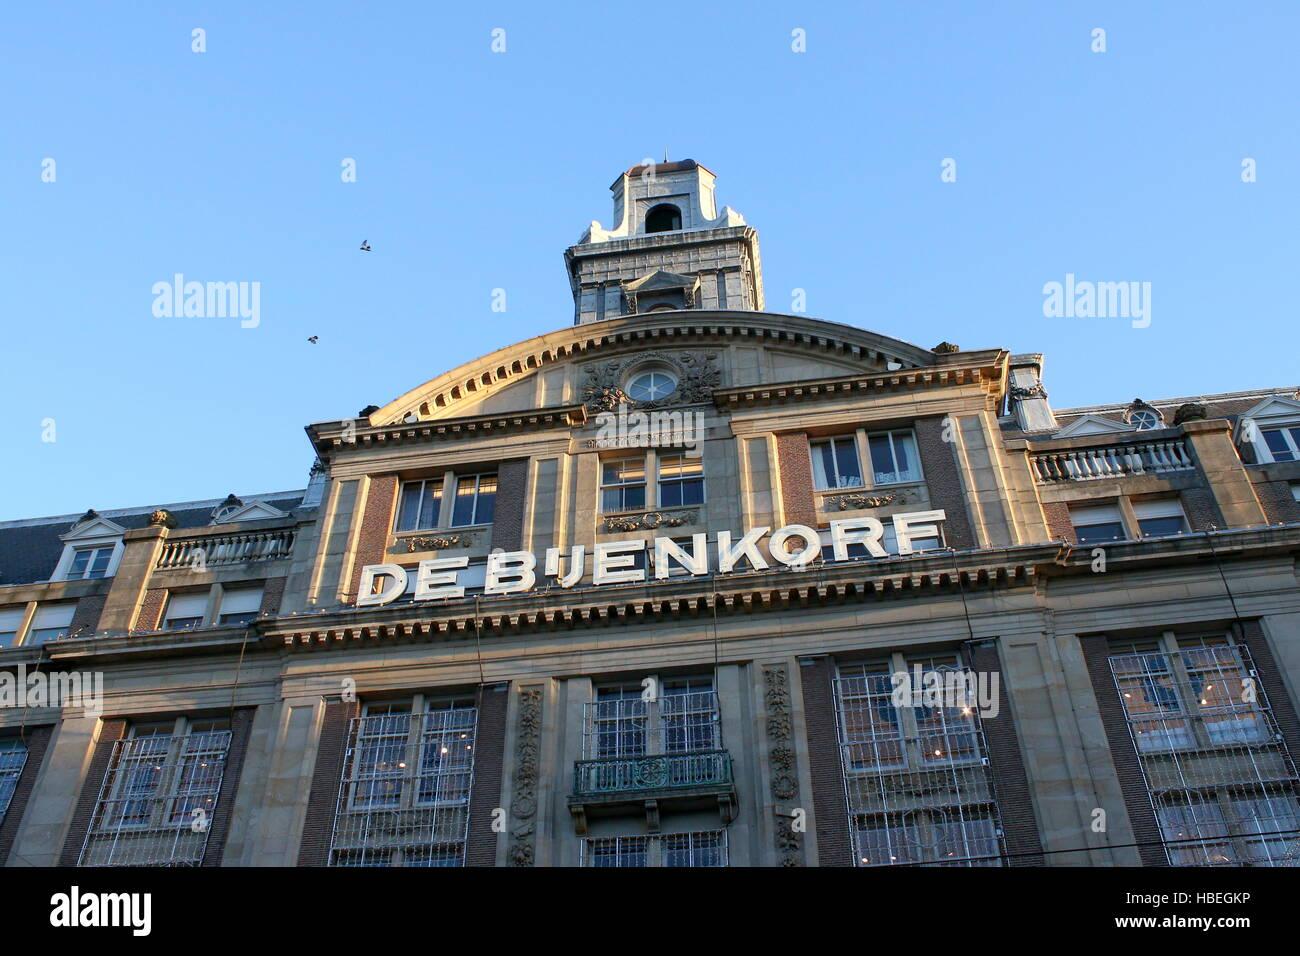 Grand Hotel Downtown Amsterdam To Dam Square